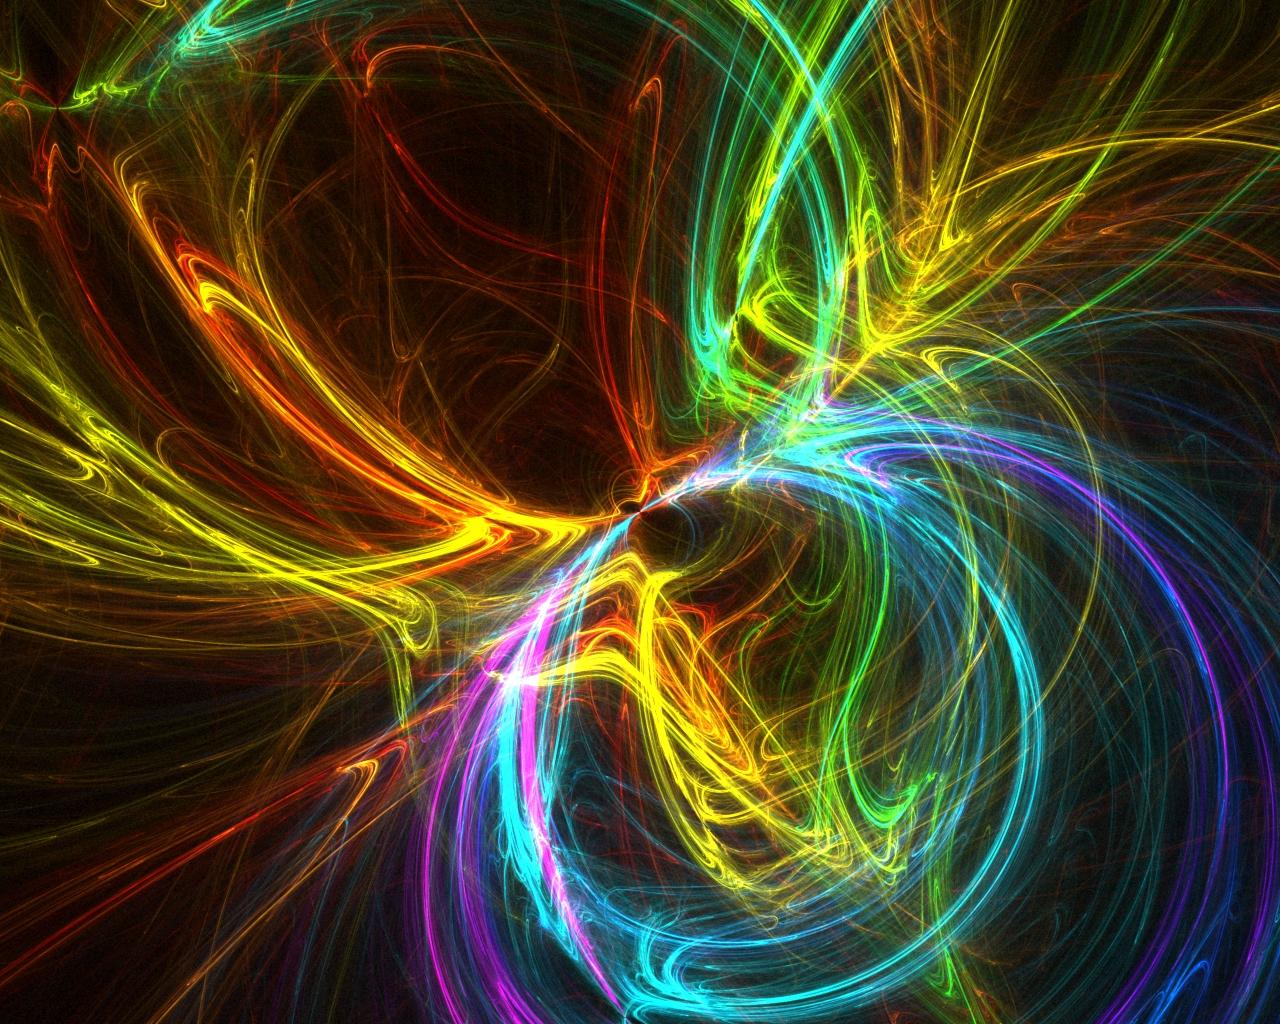 http://1.bp.blogspot.com/-qewrrCeRspw/Tkanyp3XhOI/AAAAAAAAEc0/fTRrpIeasAM/s1600/Colorful%2BSwirls%2Bwallpapers%2B-1.jpg